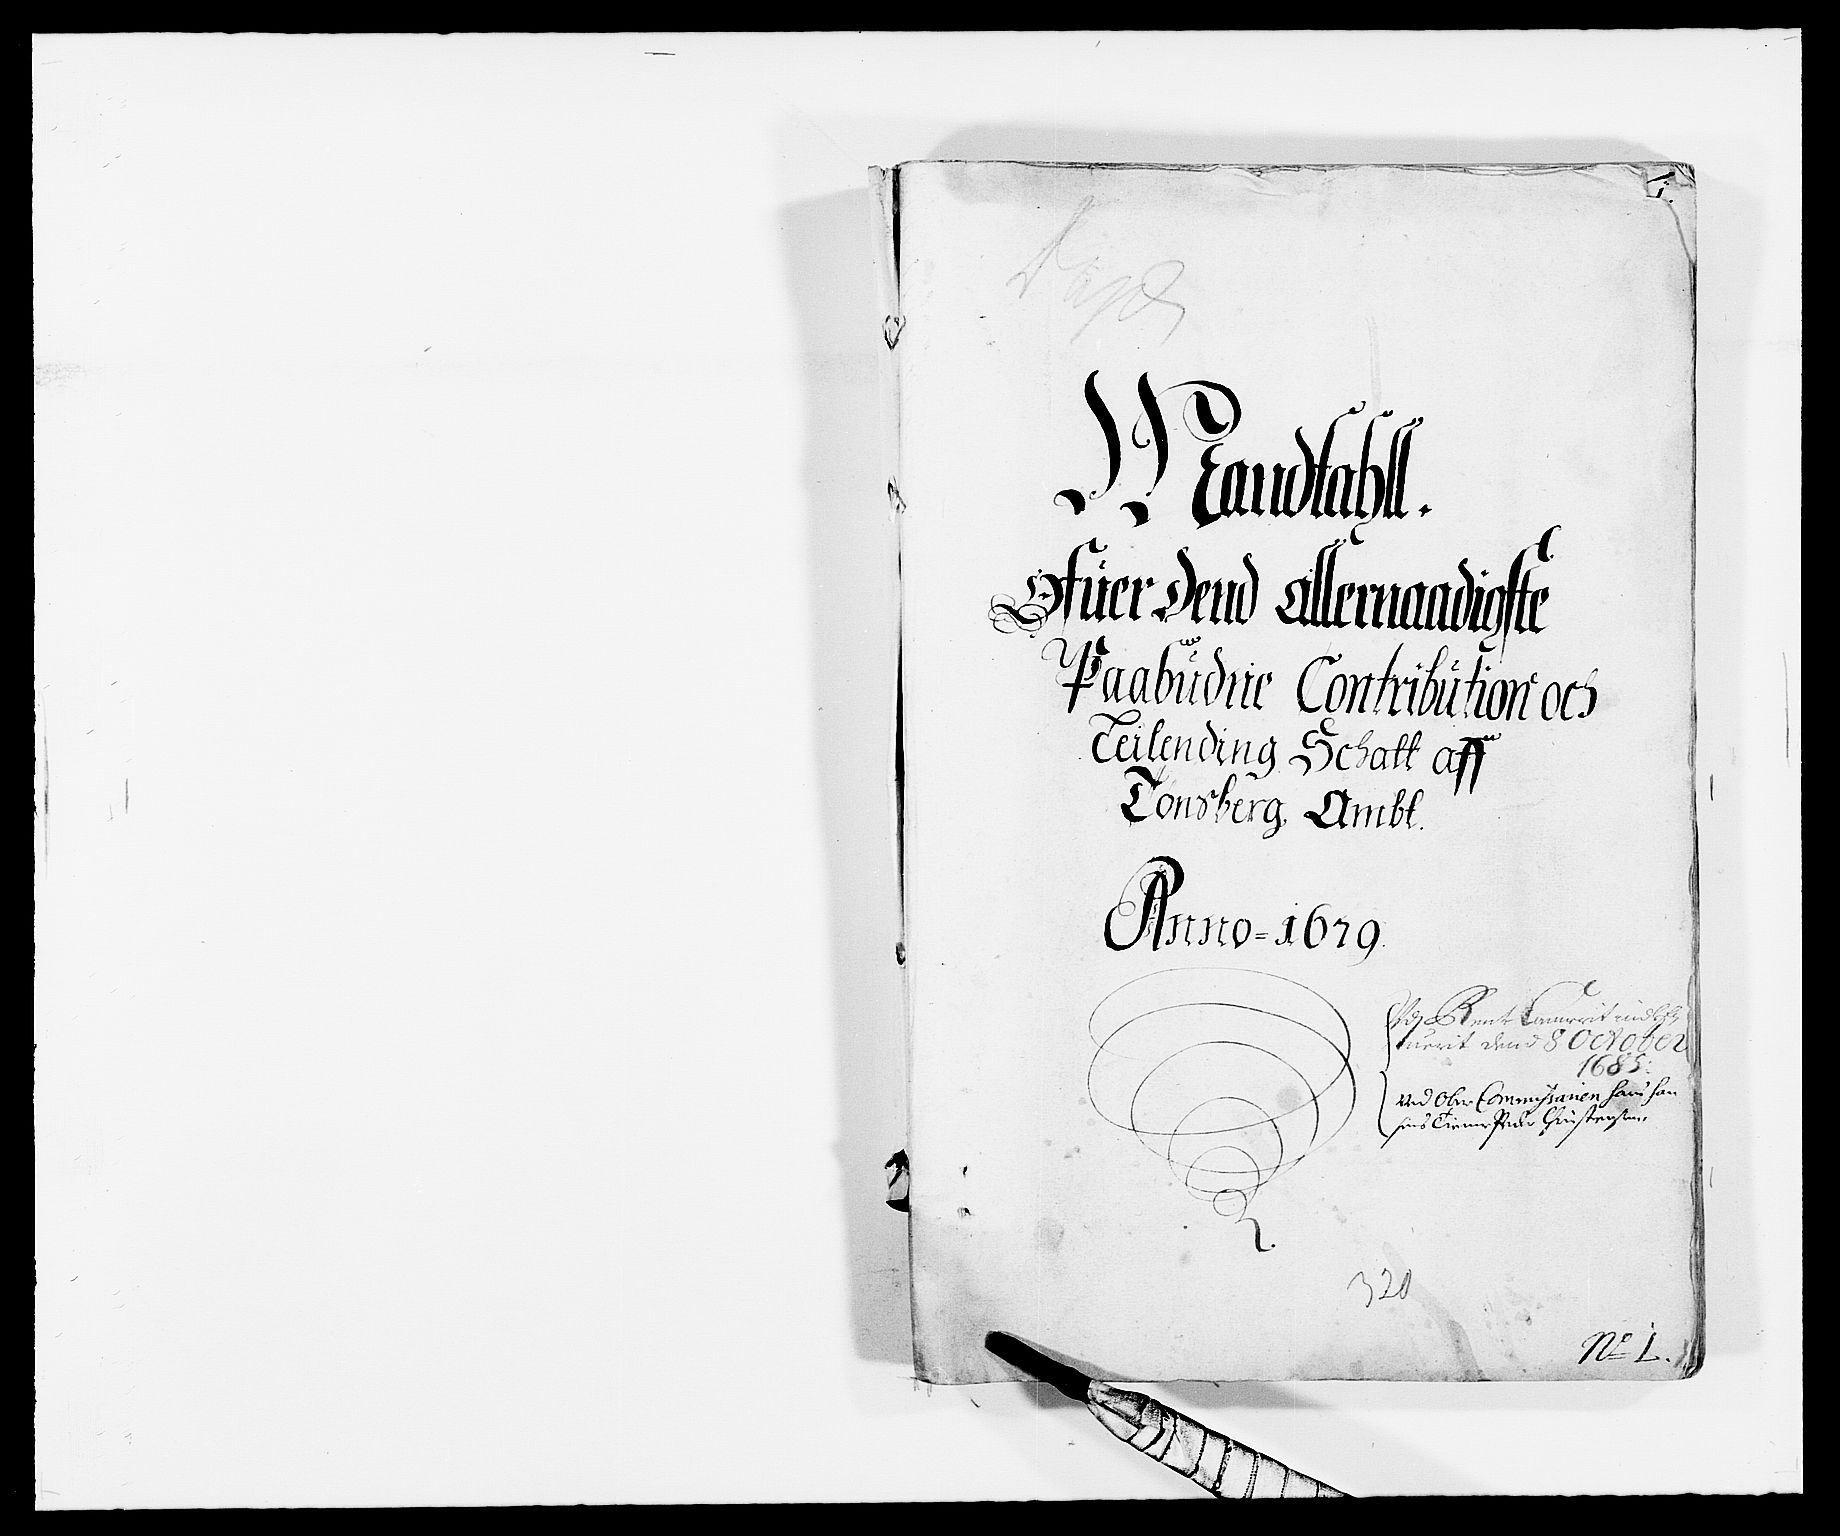 RA, Rentekammeret inntil 1814, Reviderte regnskaper, Fogderegnskap, R32/L1847: Fogderegnskap Jarlsberg grevskap, 1679-1680, s. 1